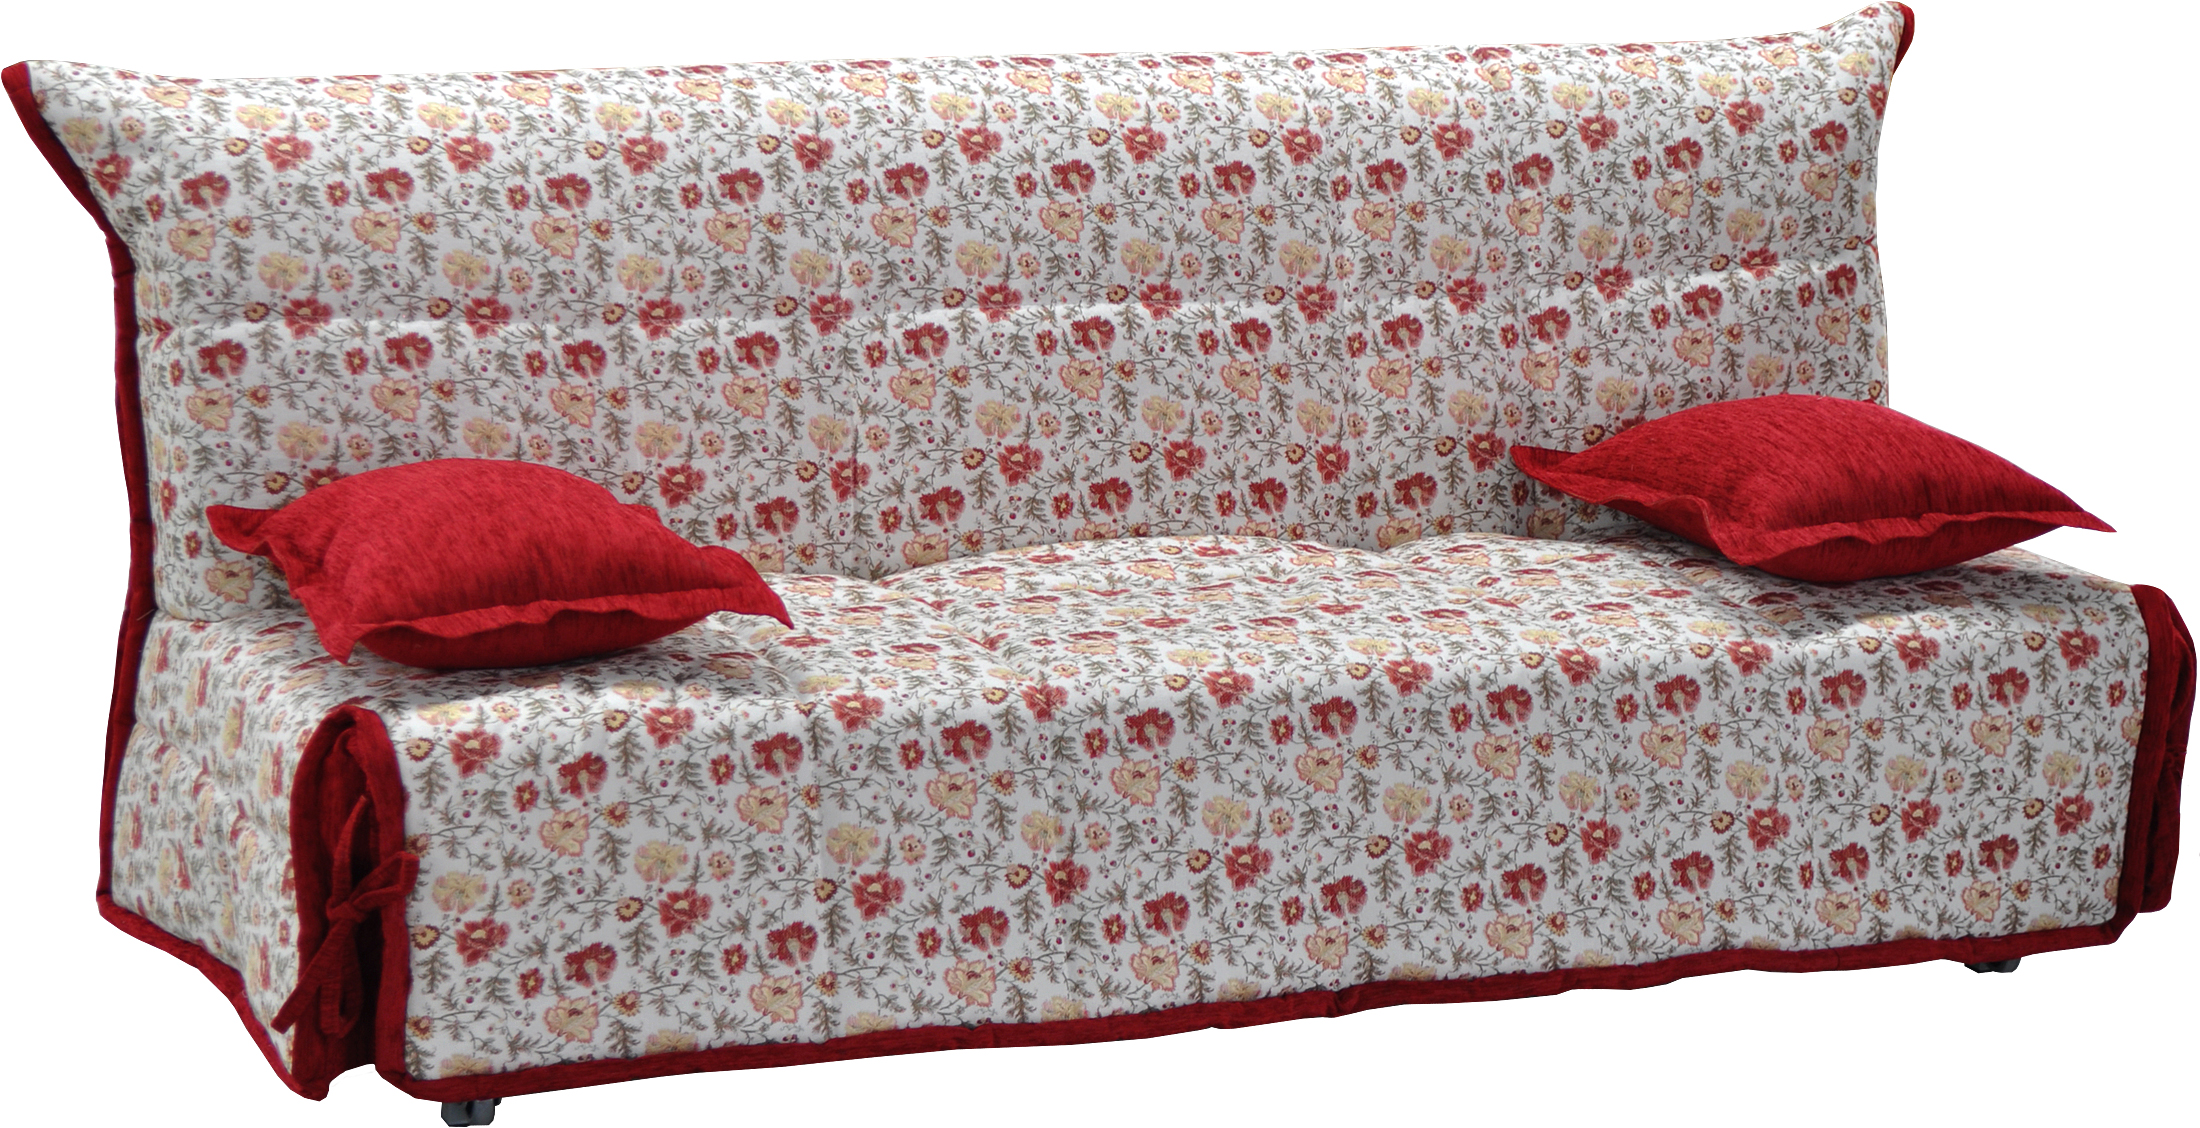 Чехол для дивана на резинке своими руками фото фото 710